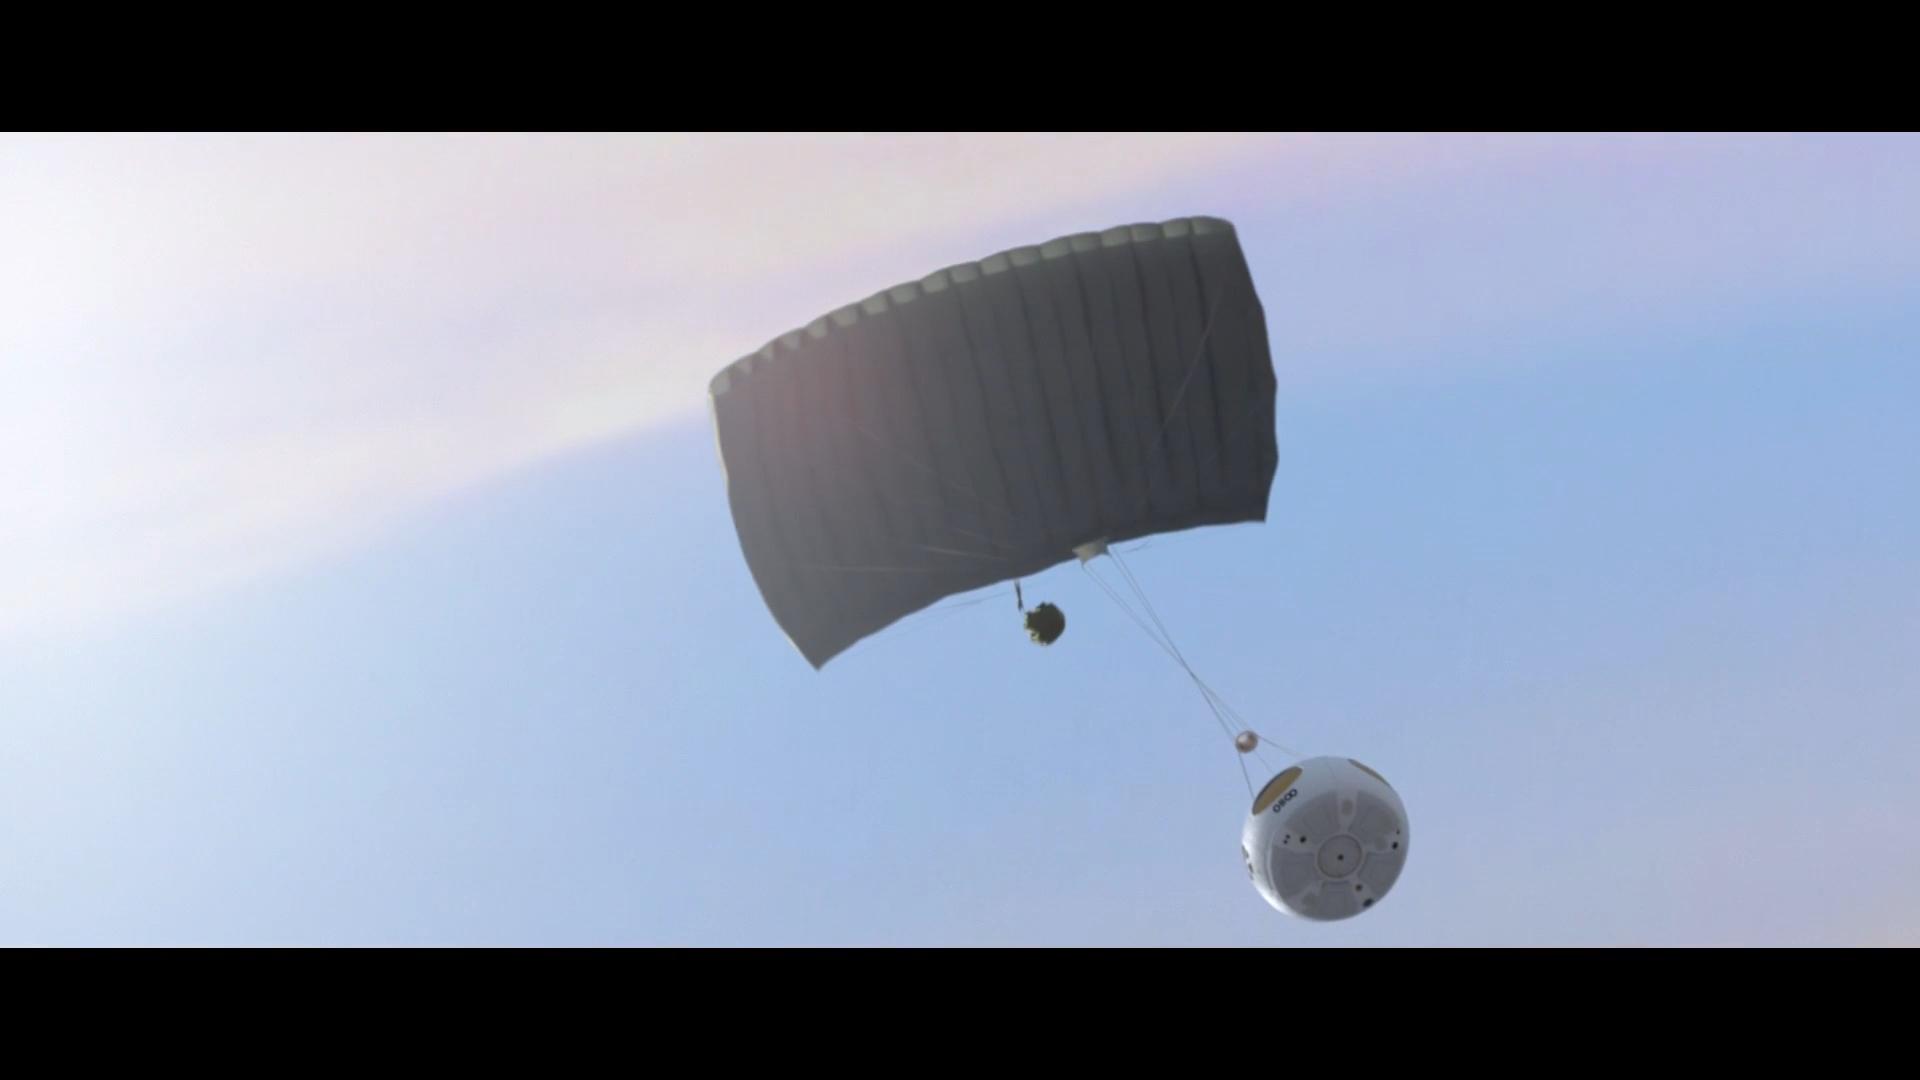 Приземление капсулы Bloon на парашюте